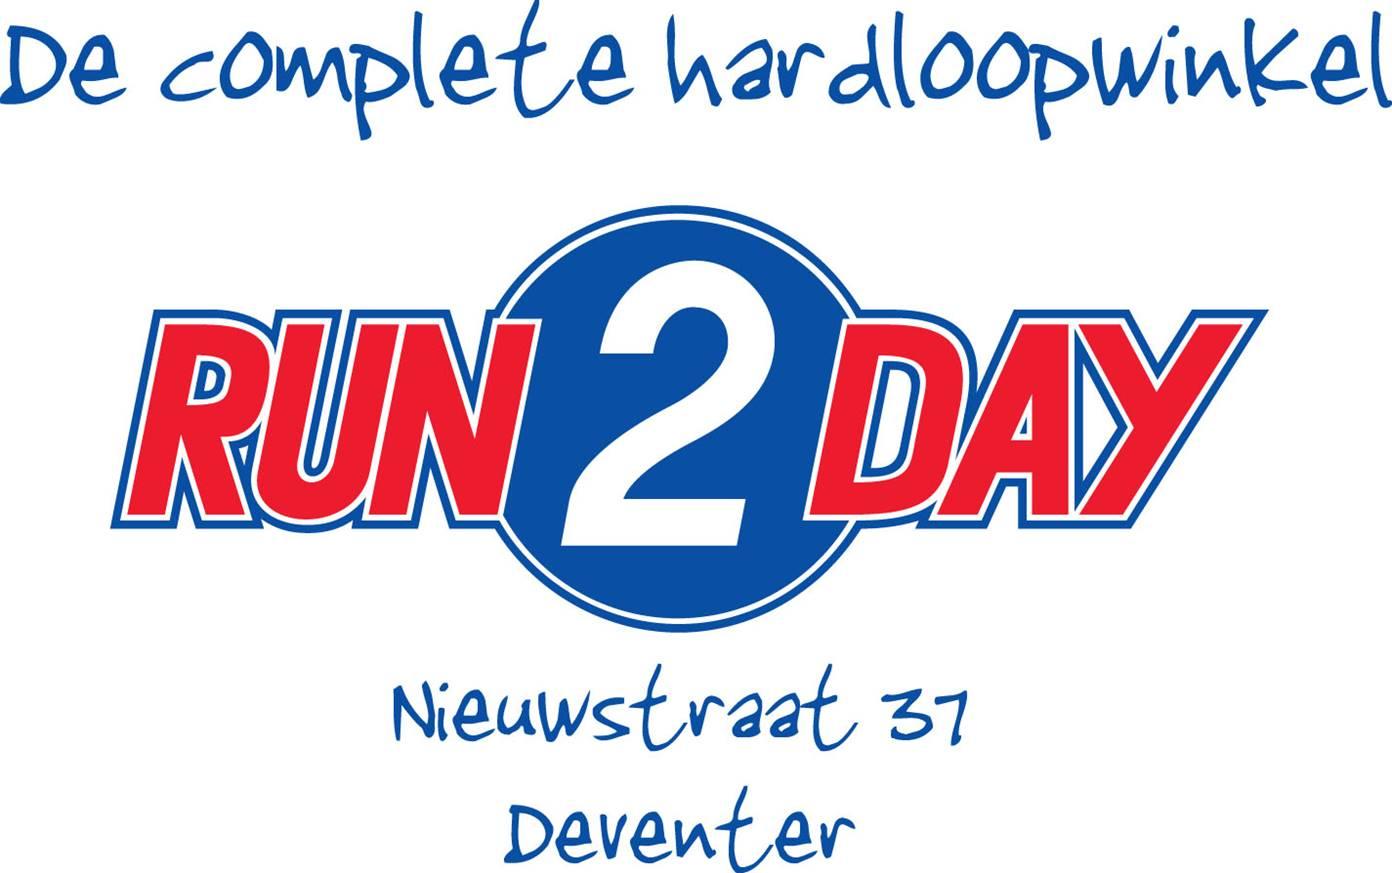 Run2Day Deventer